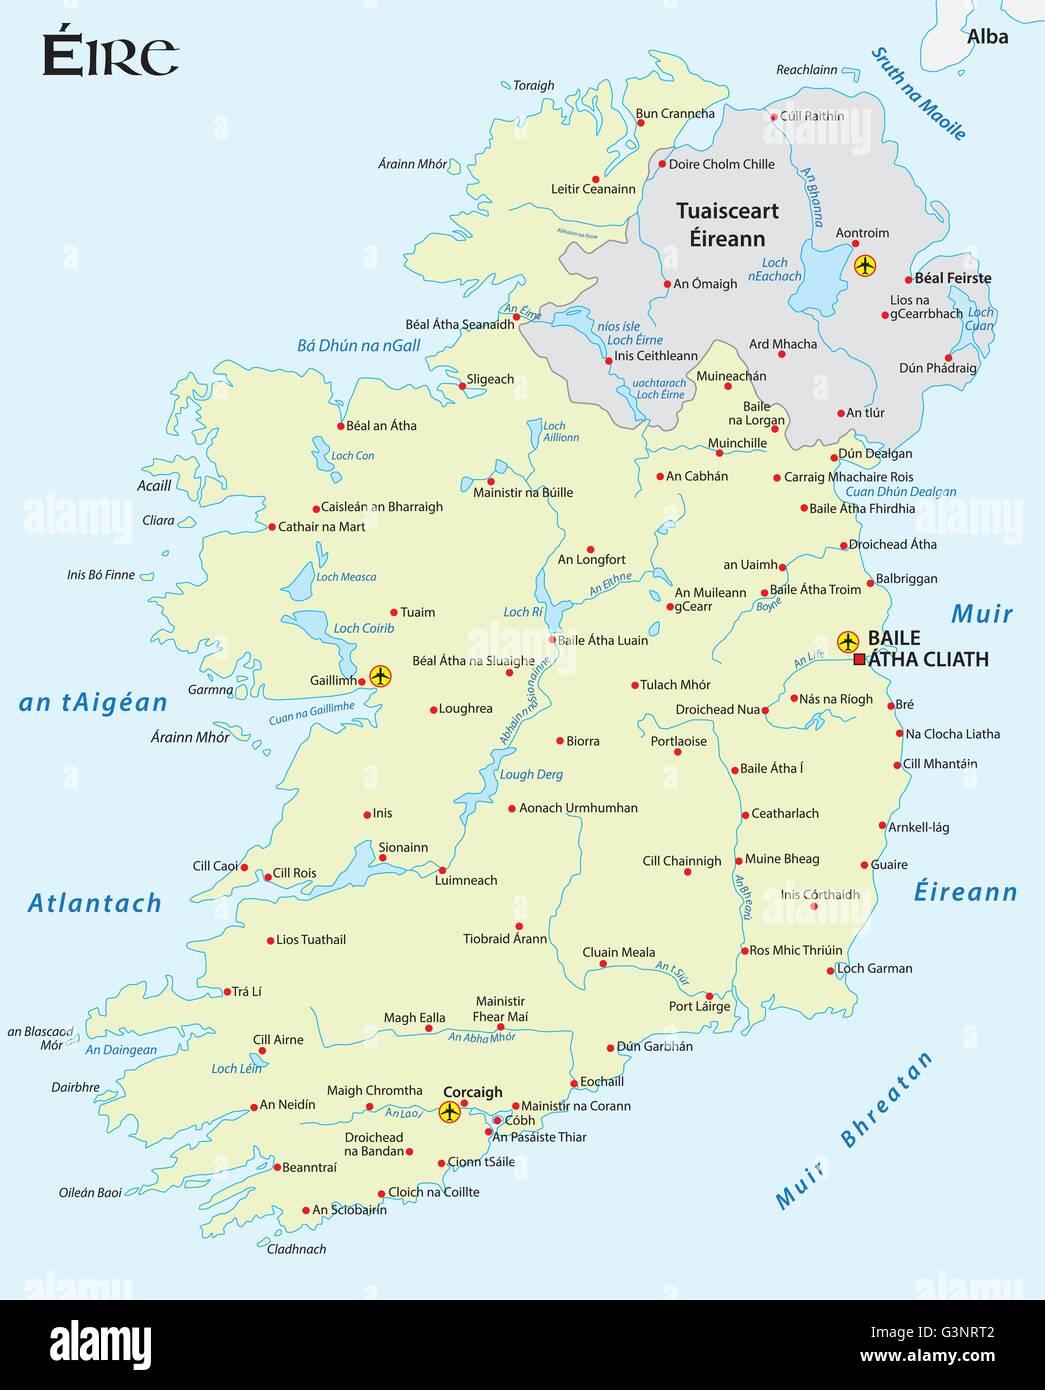 vector map of the Irish republic in Irish Gaelic language - Stock Image